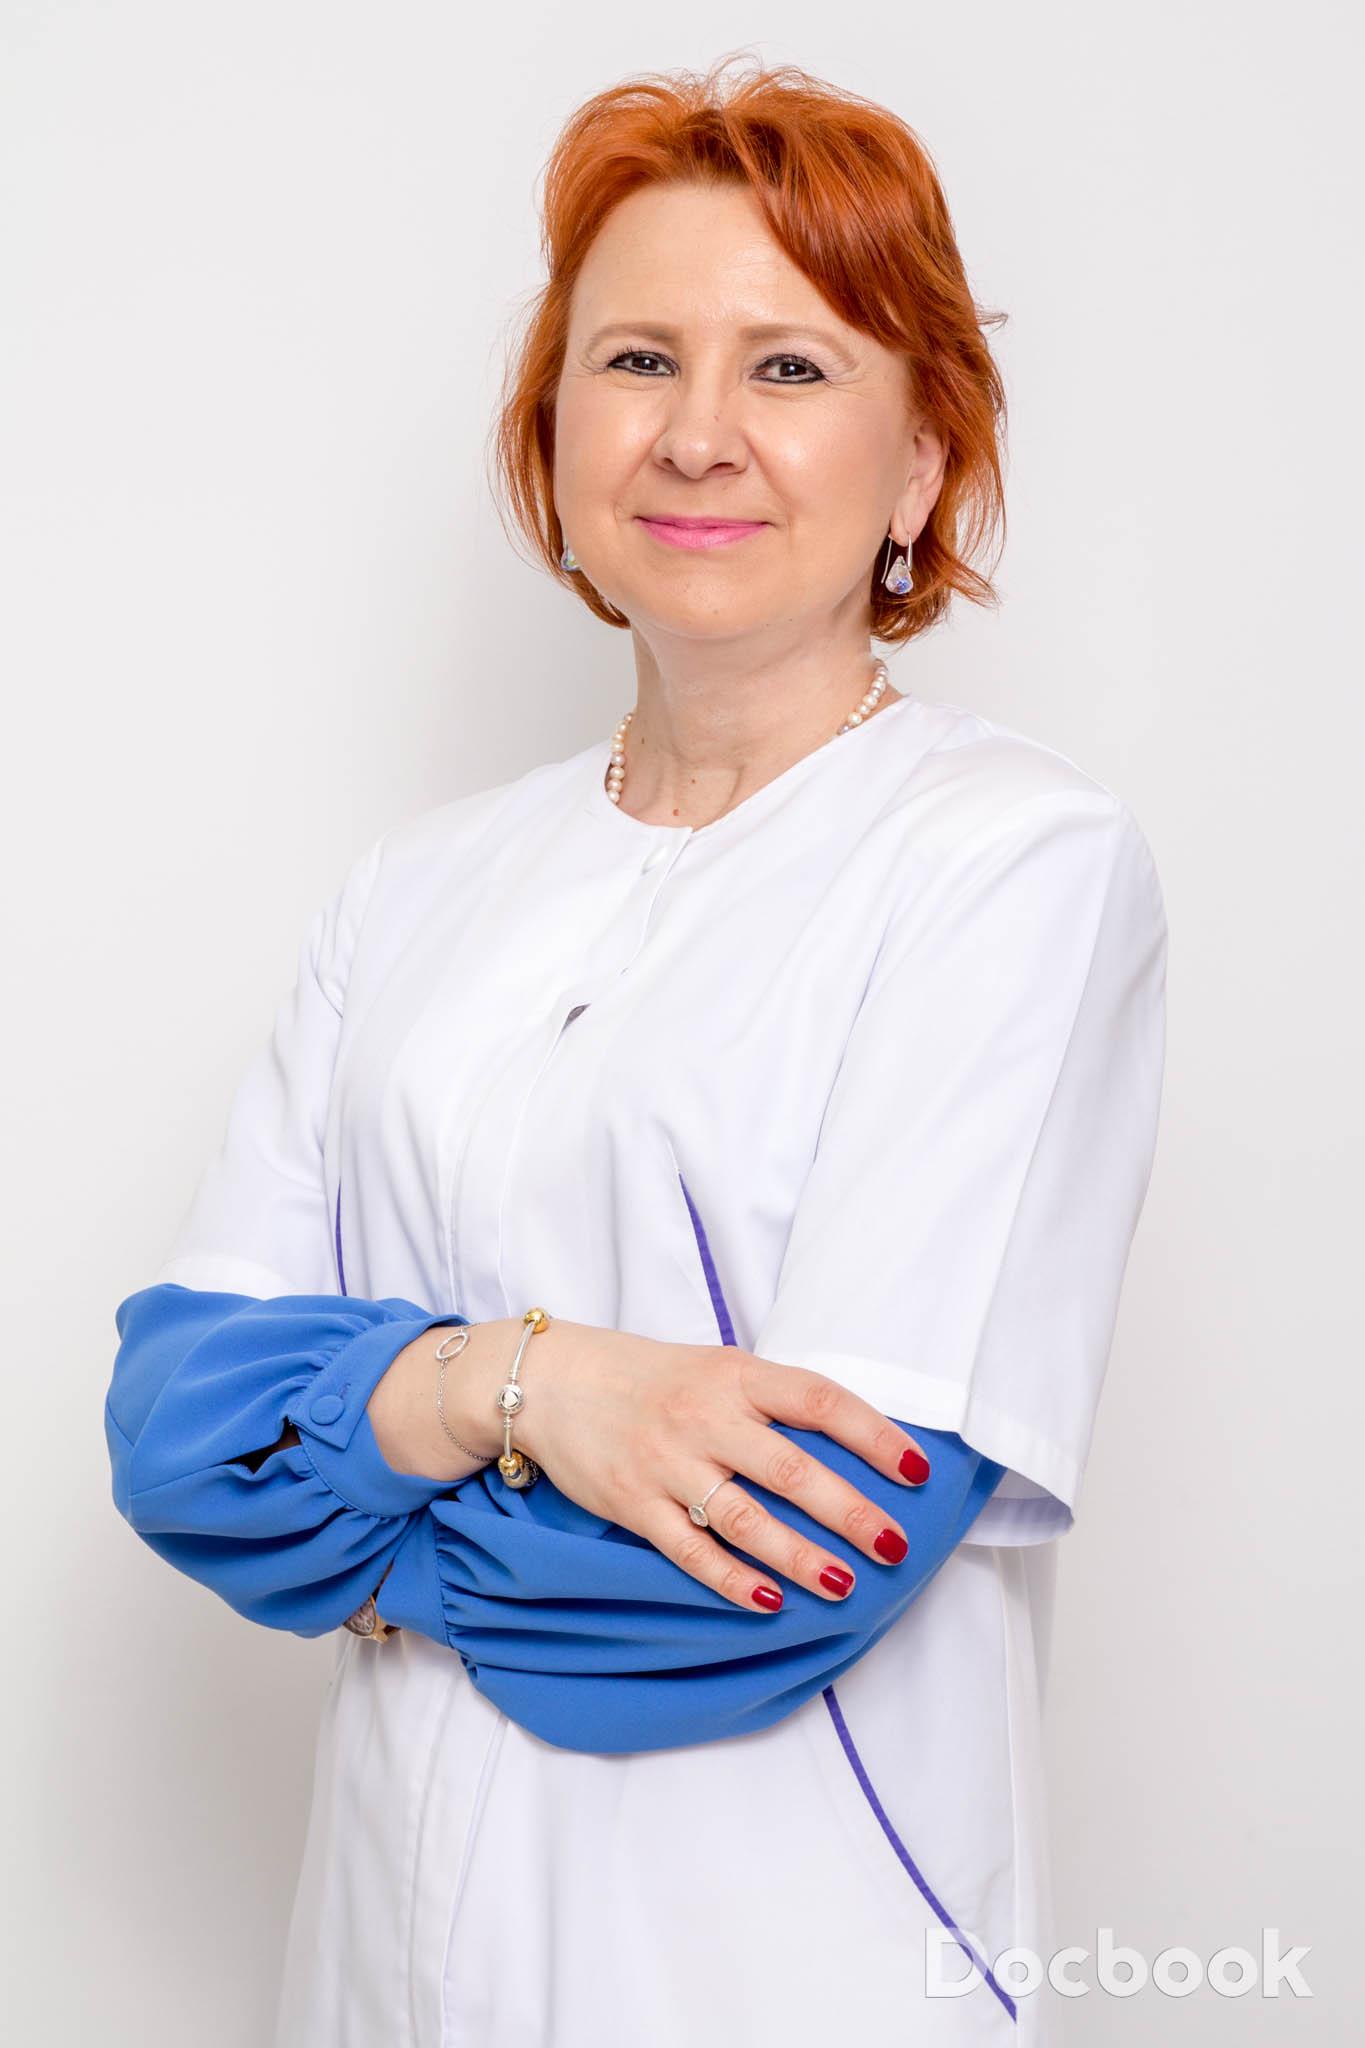 Dr. Elena-Lacramioara Dumitrache